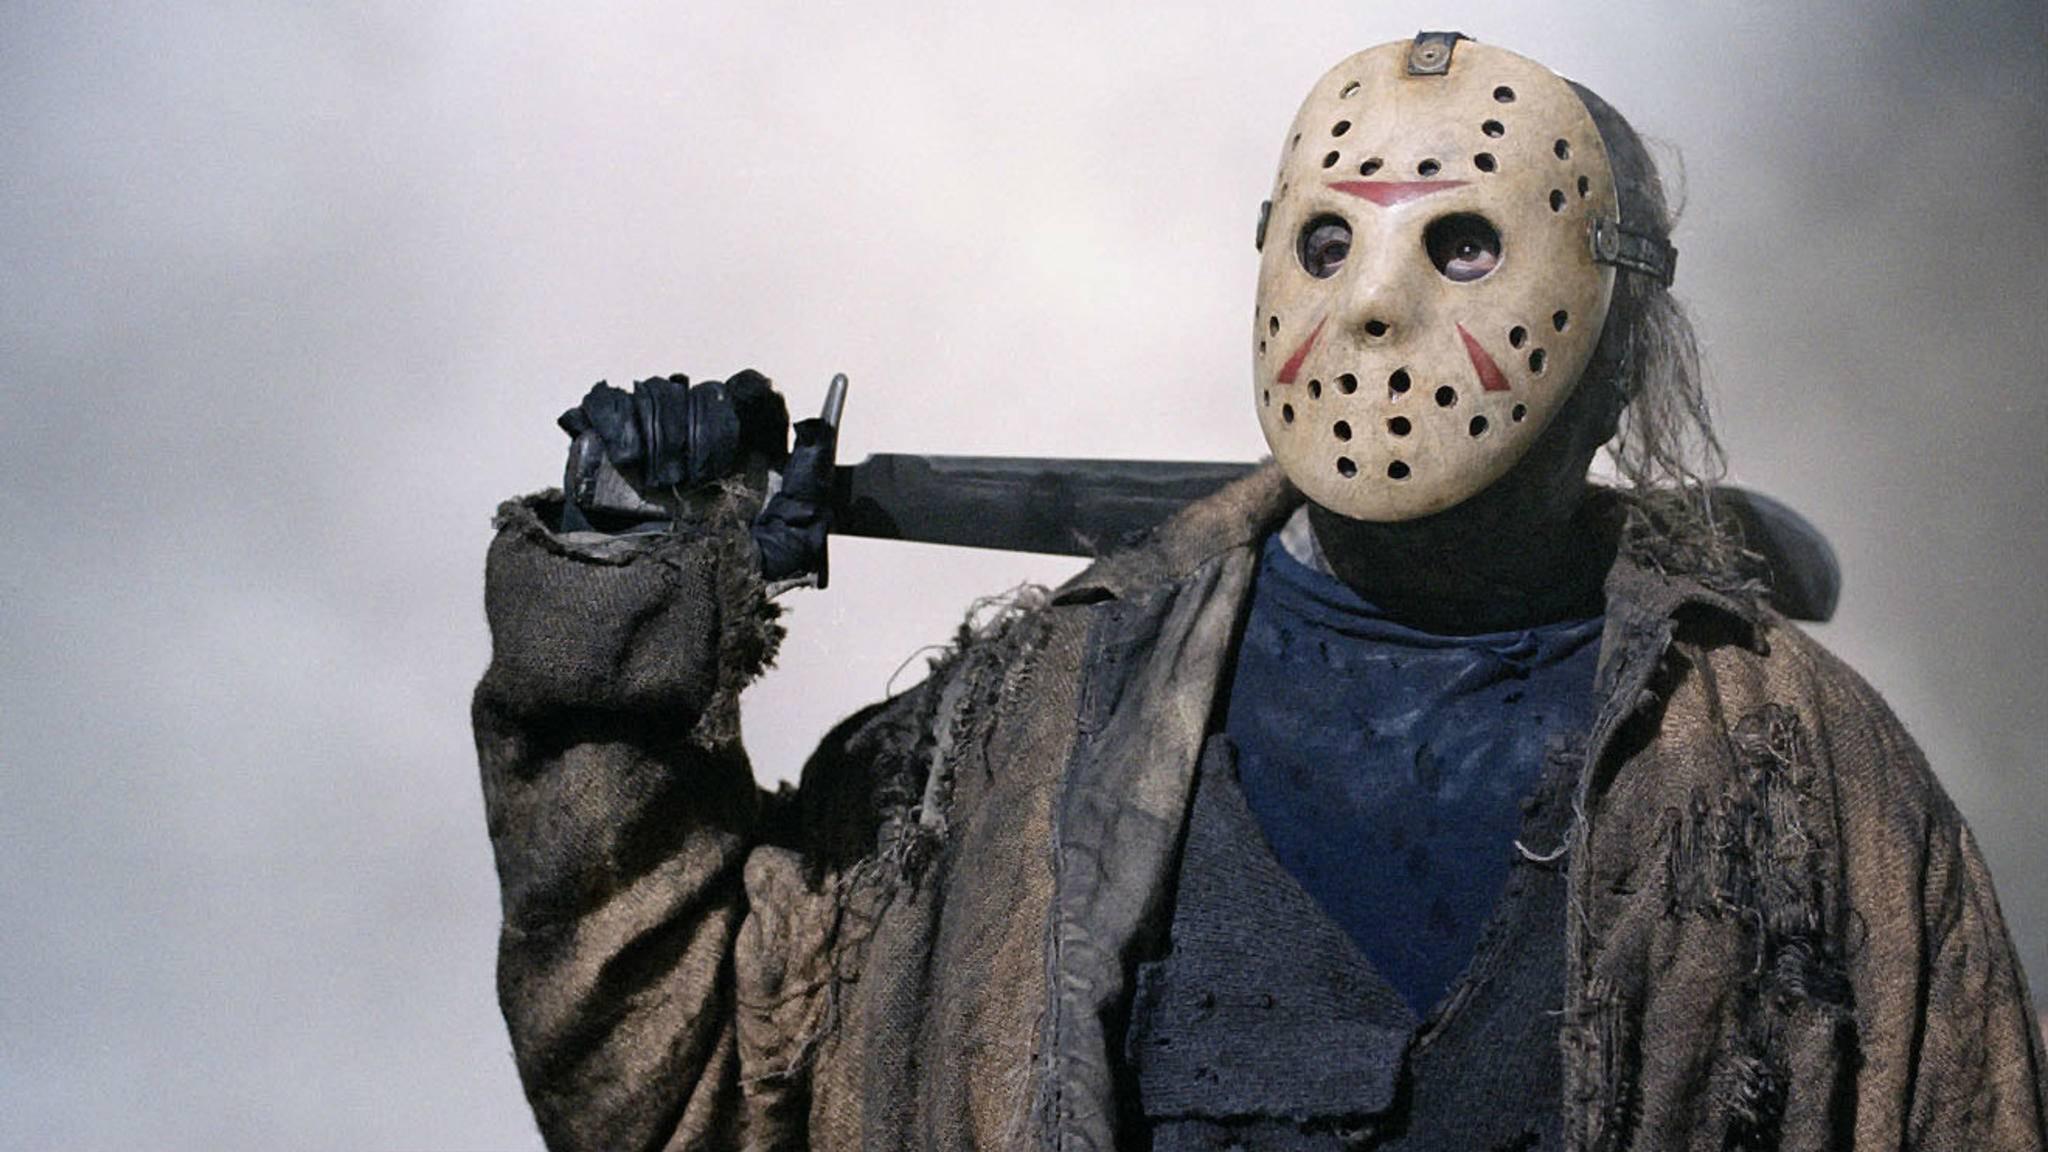 Press X to Jason.